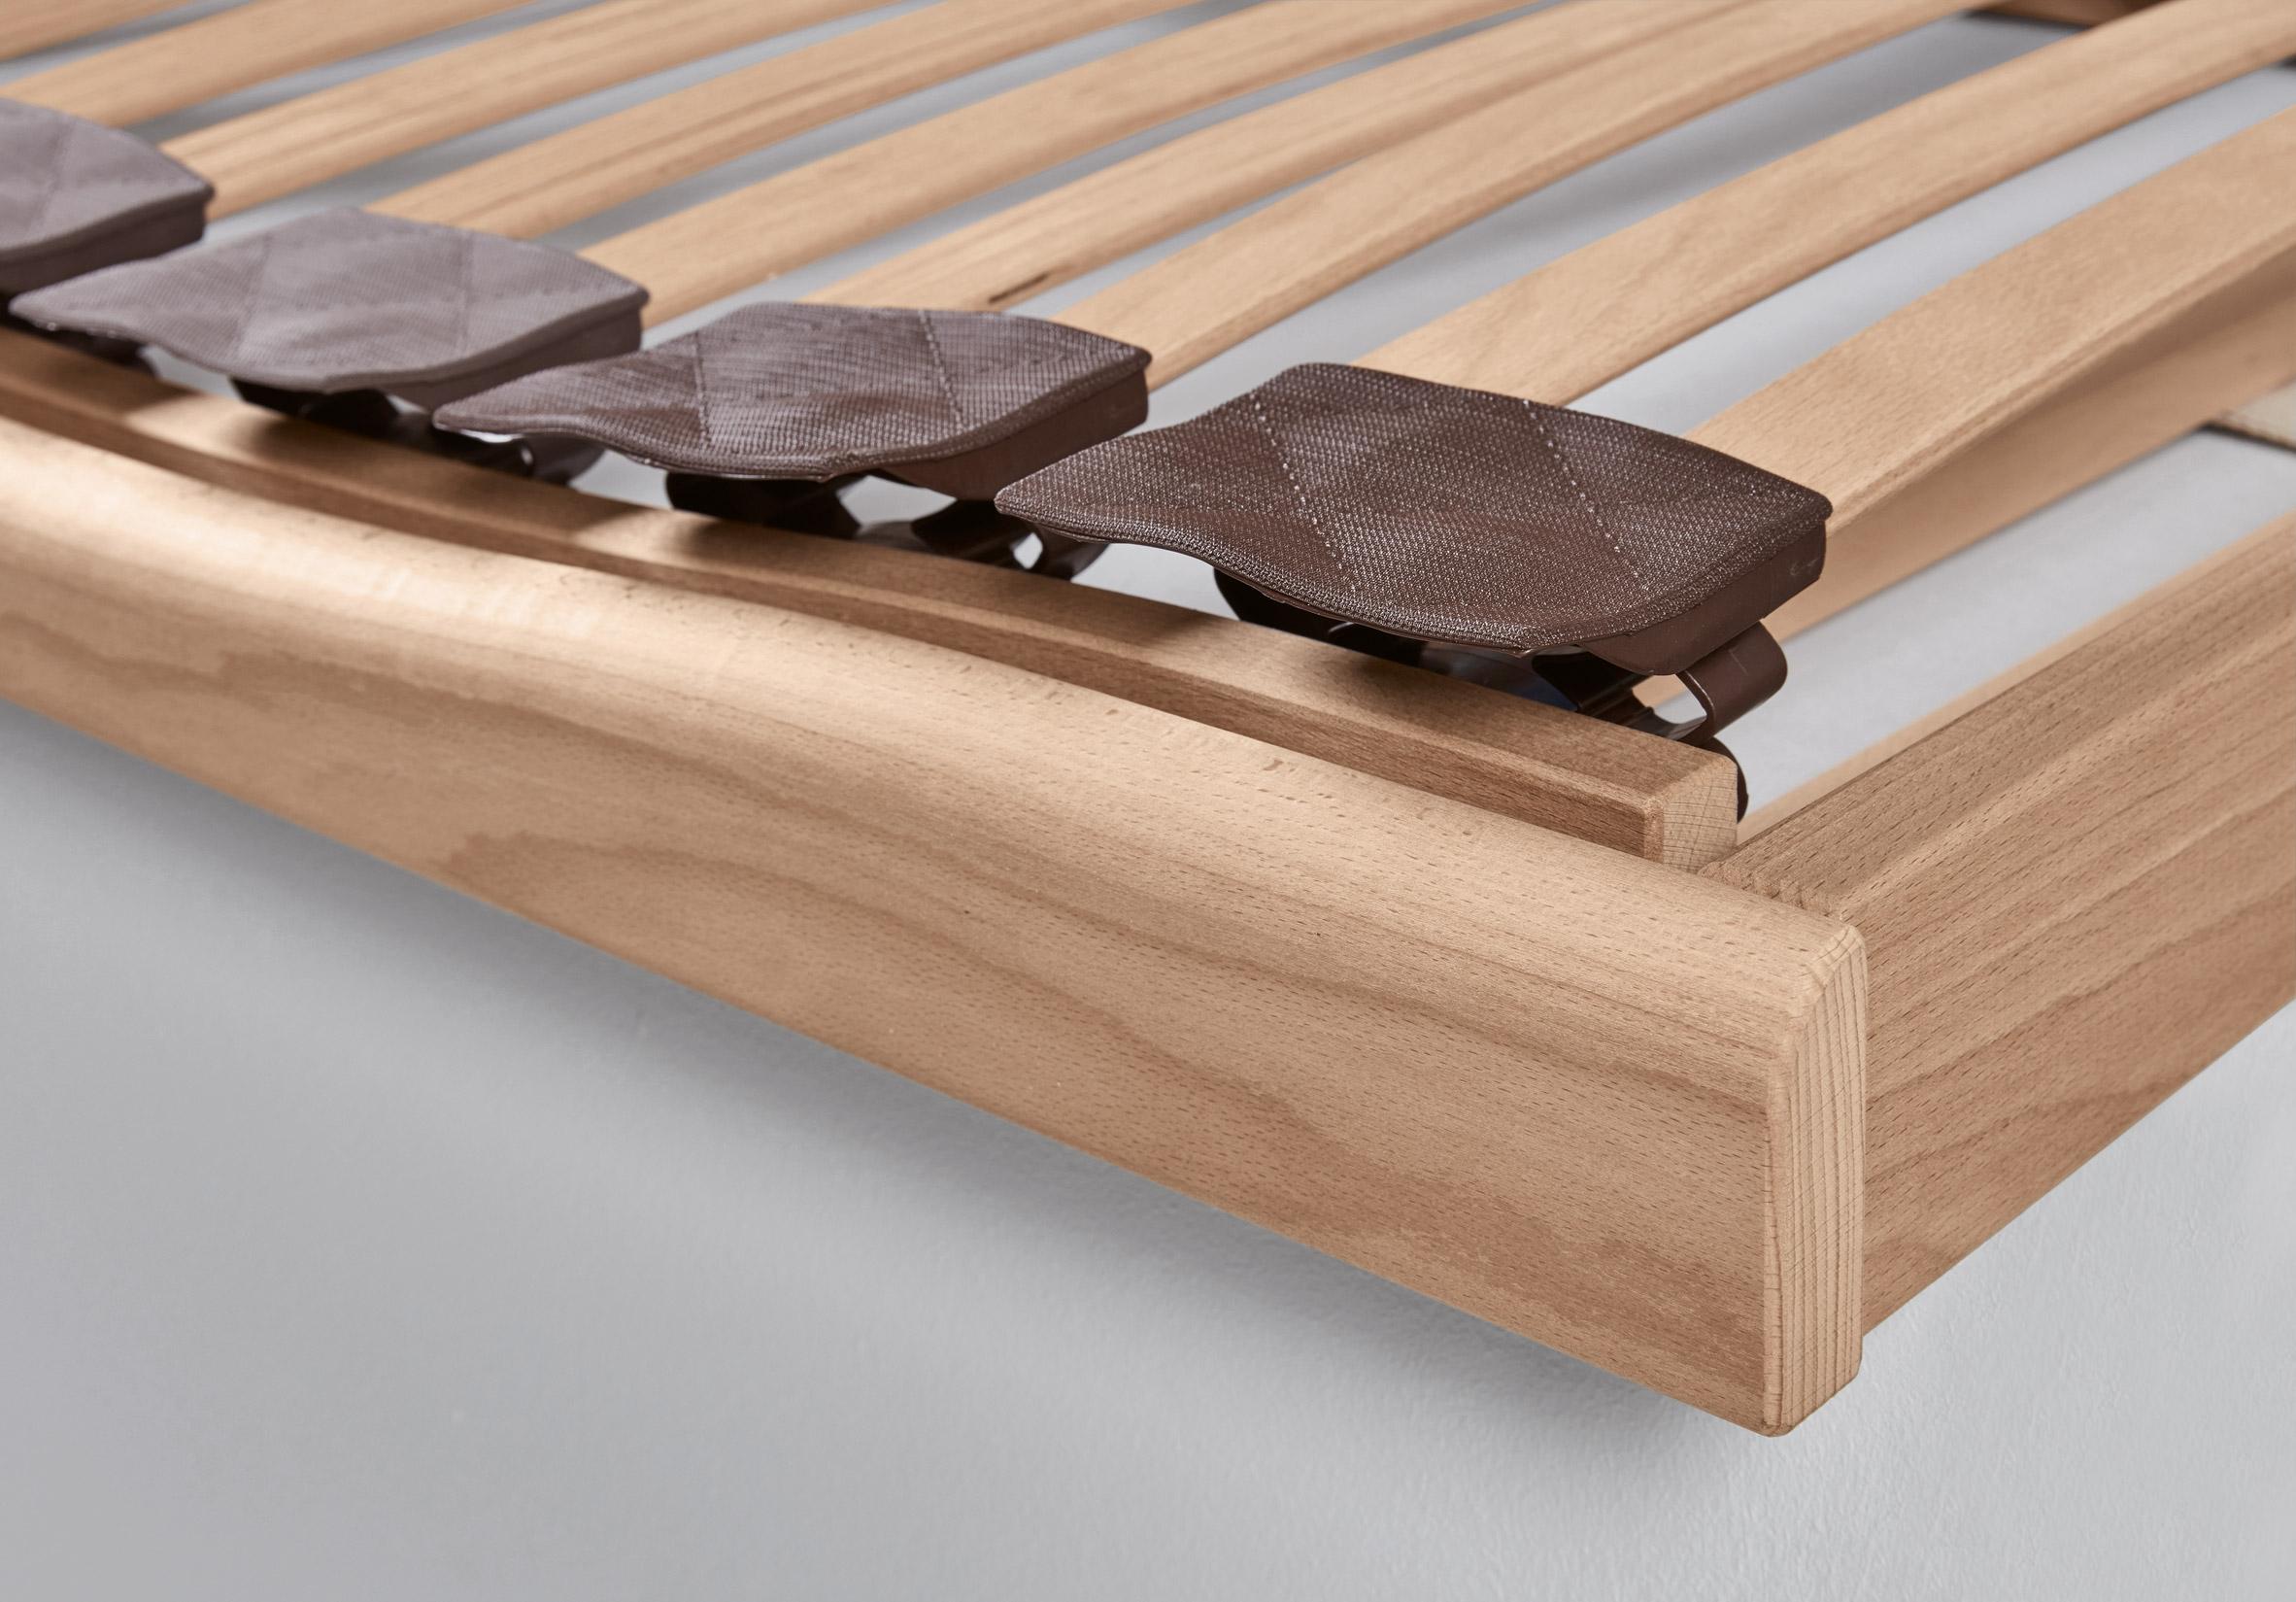 imm-cologne-2017-design-furniture-beds-birkenstock_dezeen_2364_col_17